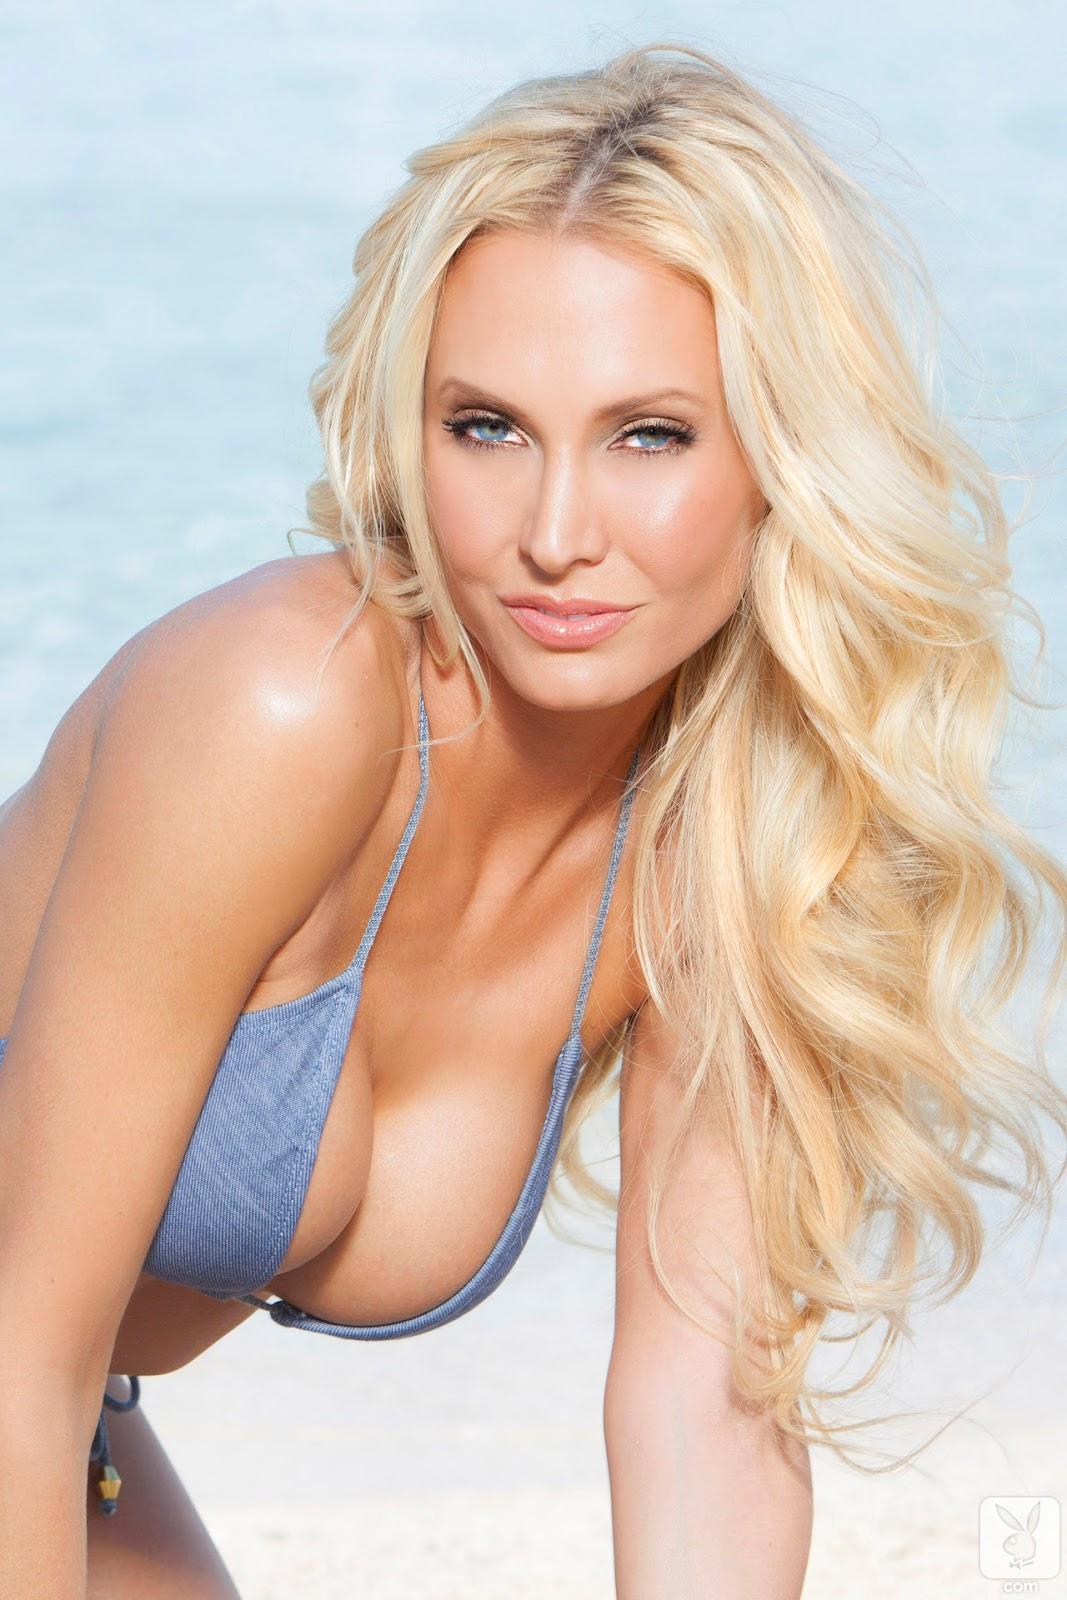 A Look At A Studio At Disney S Hilton Head Island Resort: A Look At Stunningly Hot Model Jennifer Vaughn